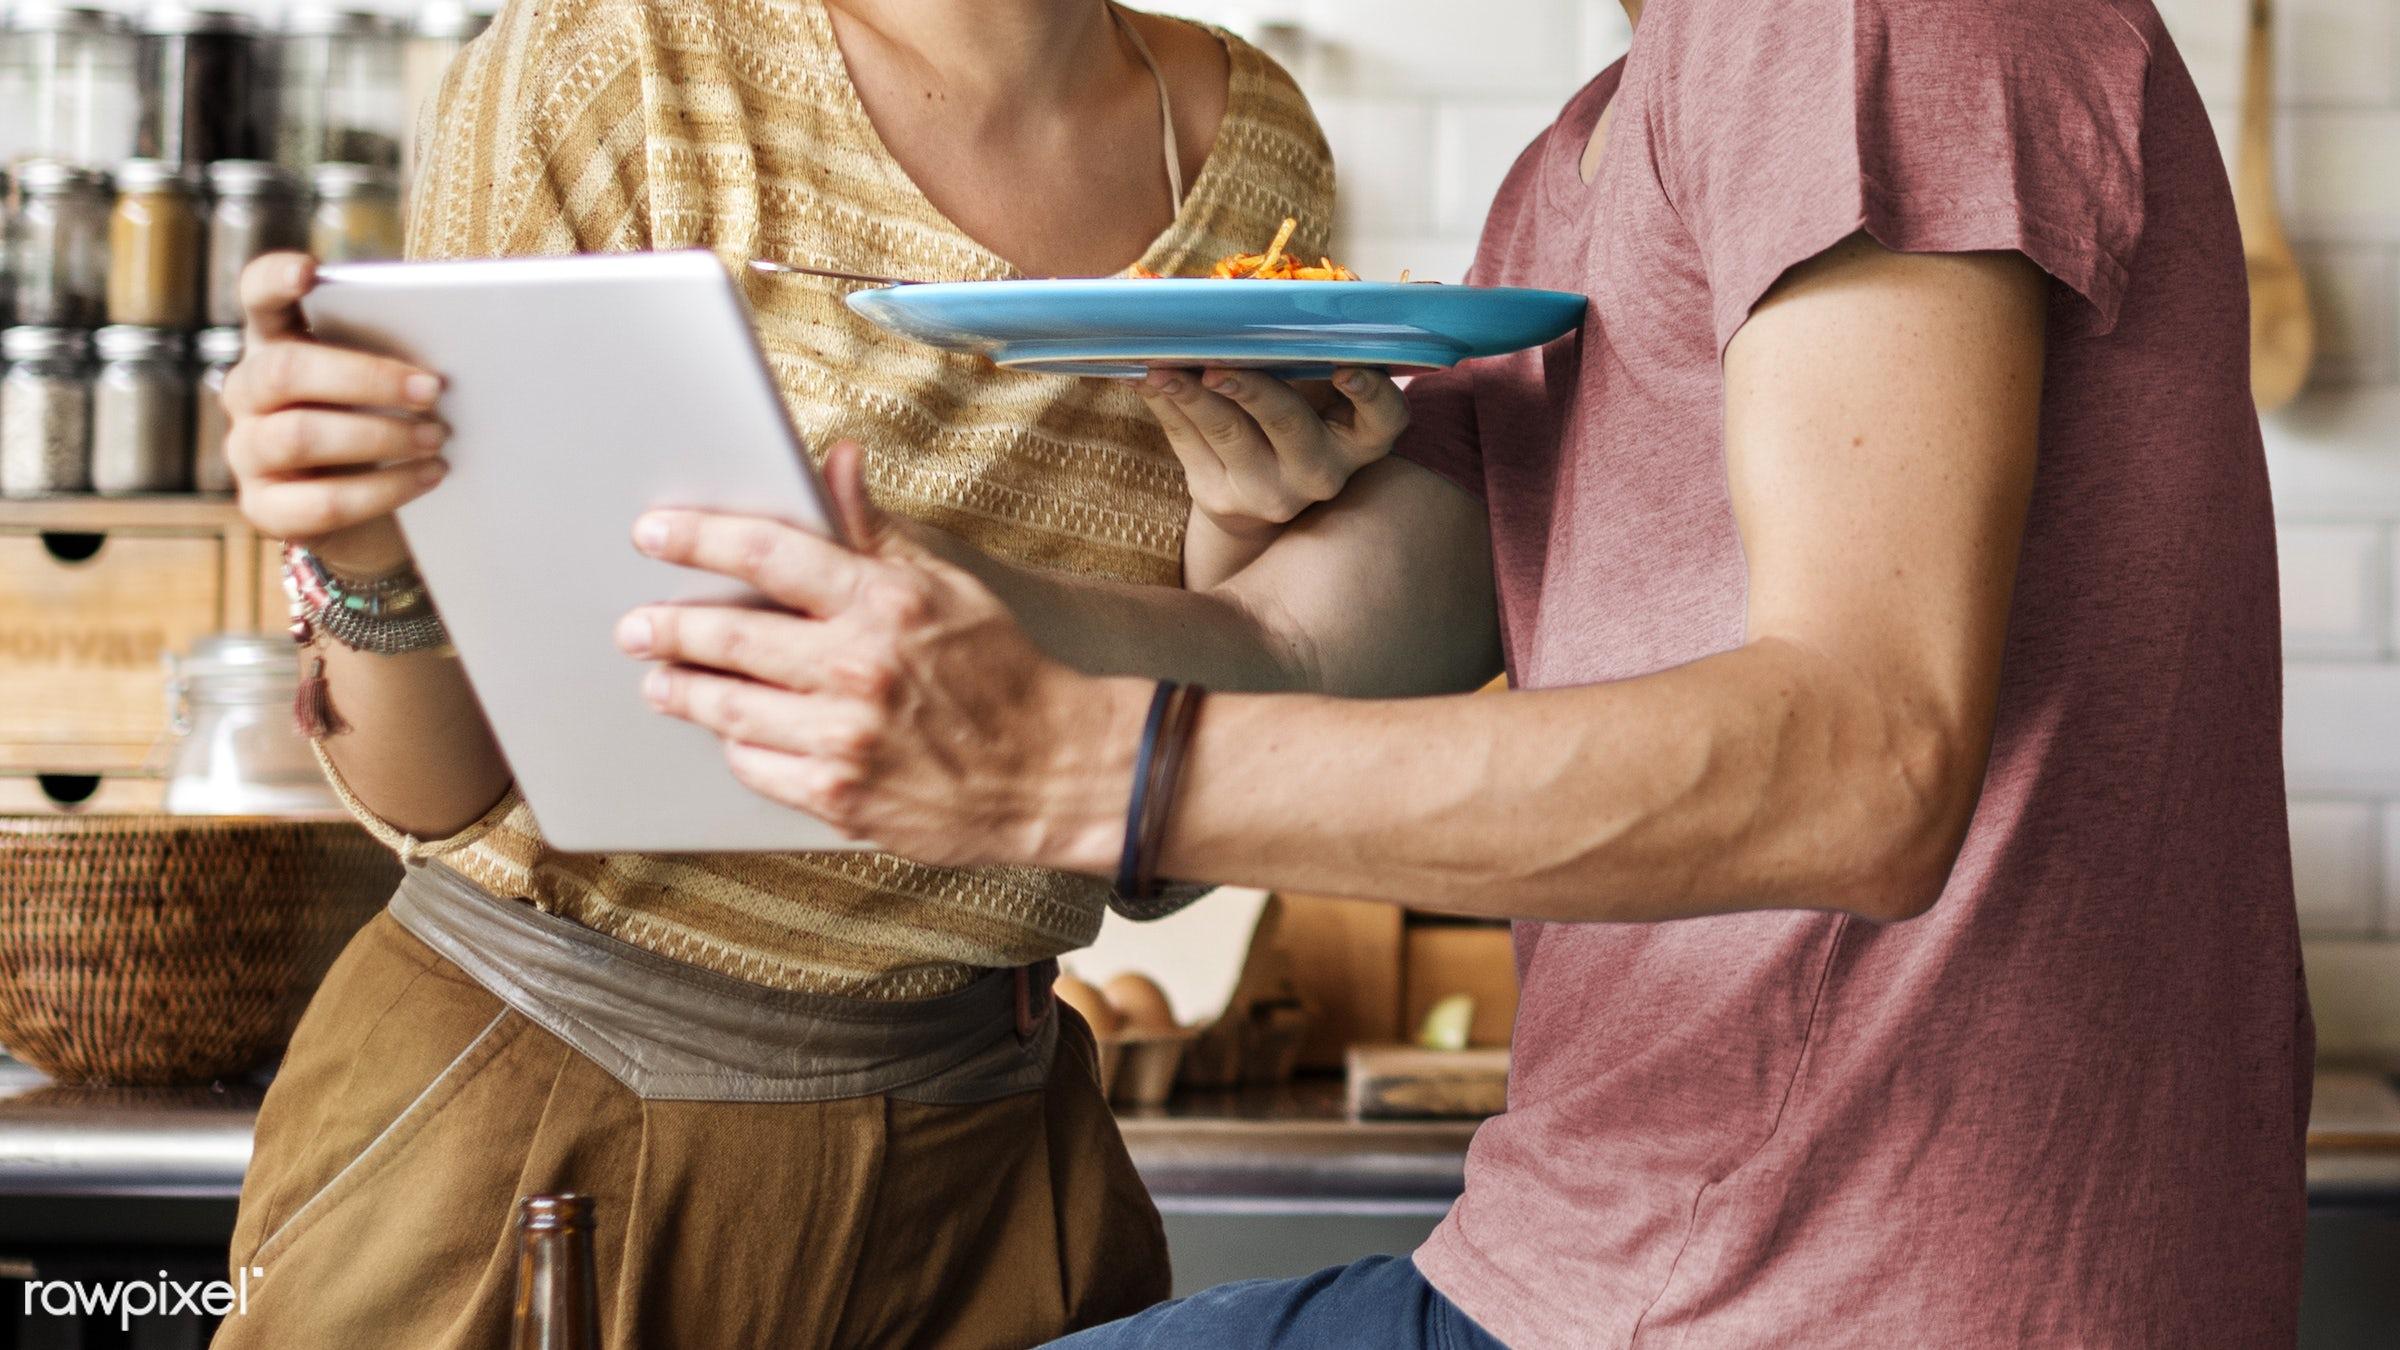 activity, bonding, boyfriend, breakfast, casual, cheerful, connection, couple, cuisine, culinary, dietary, dinner, eating,...